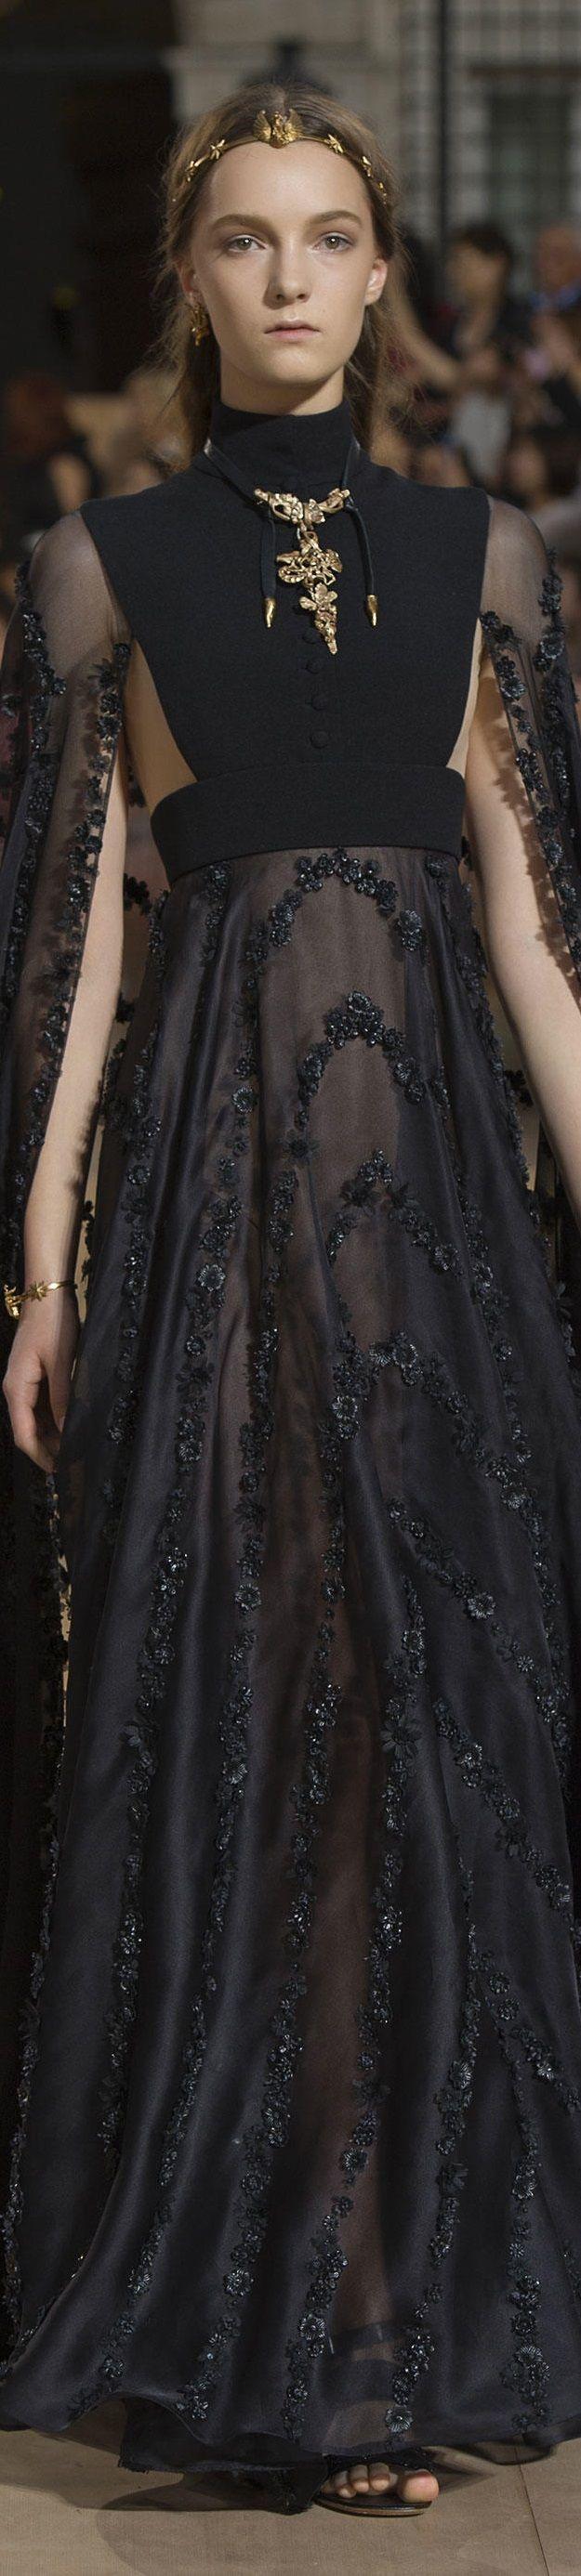 Evening Dress Valentino FW 2015 couture. Luxury, fashion, weddings, bridal style...